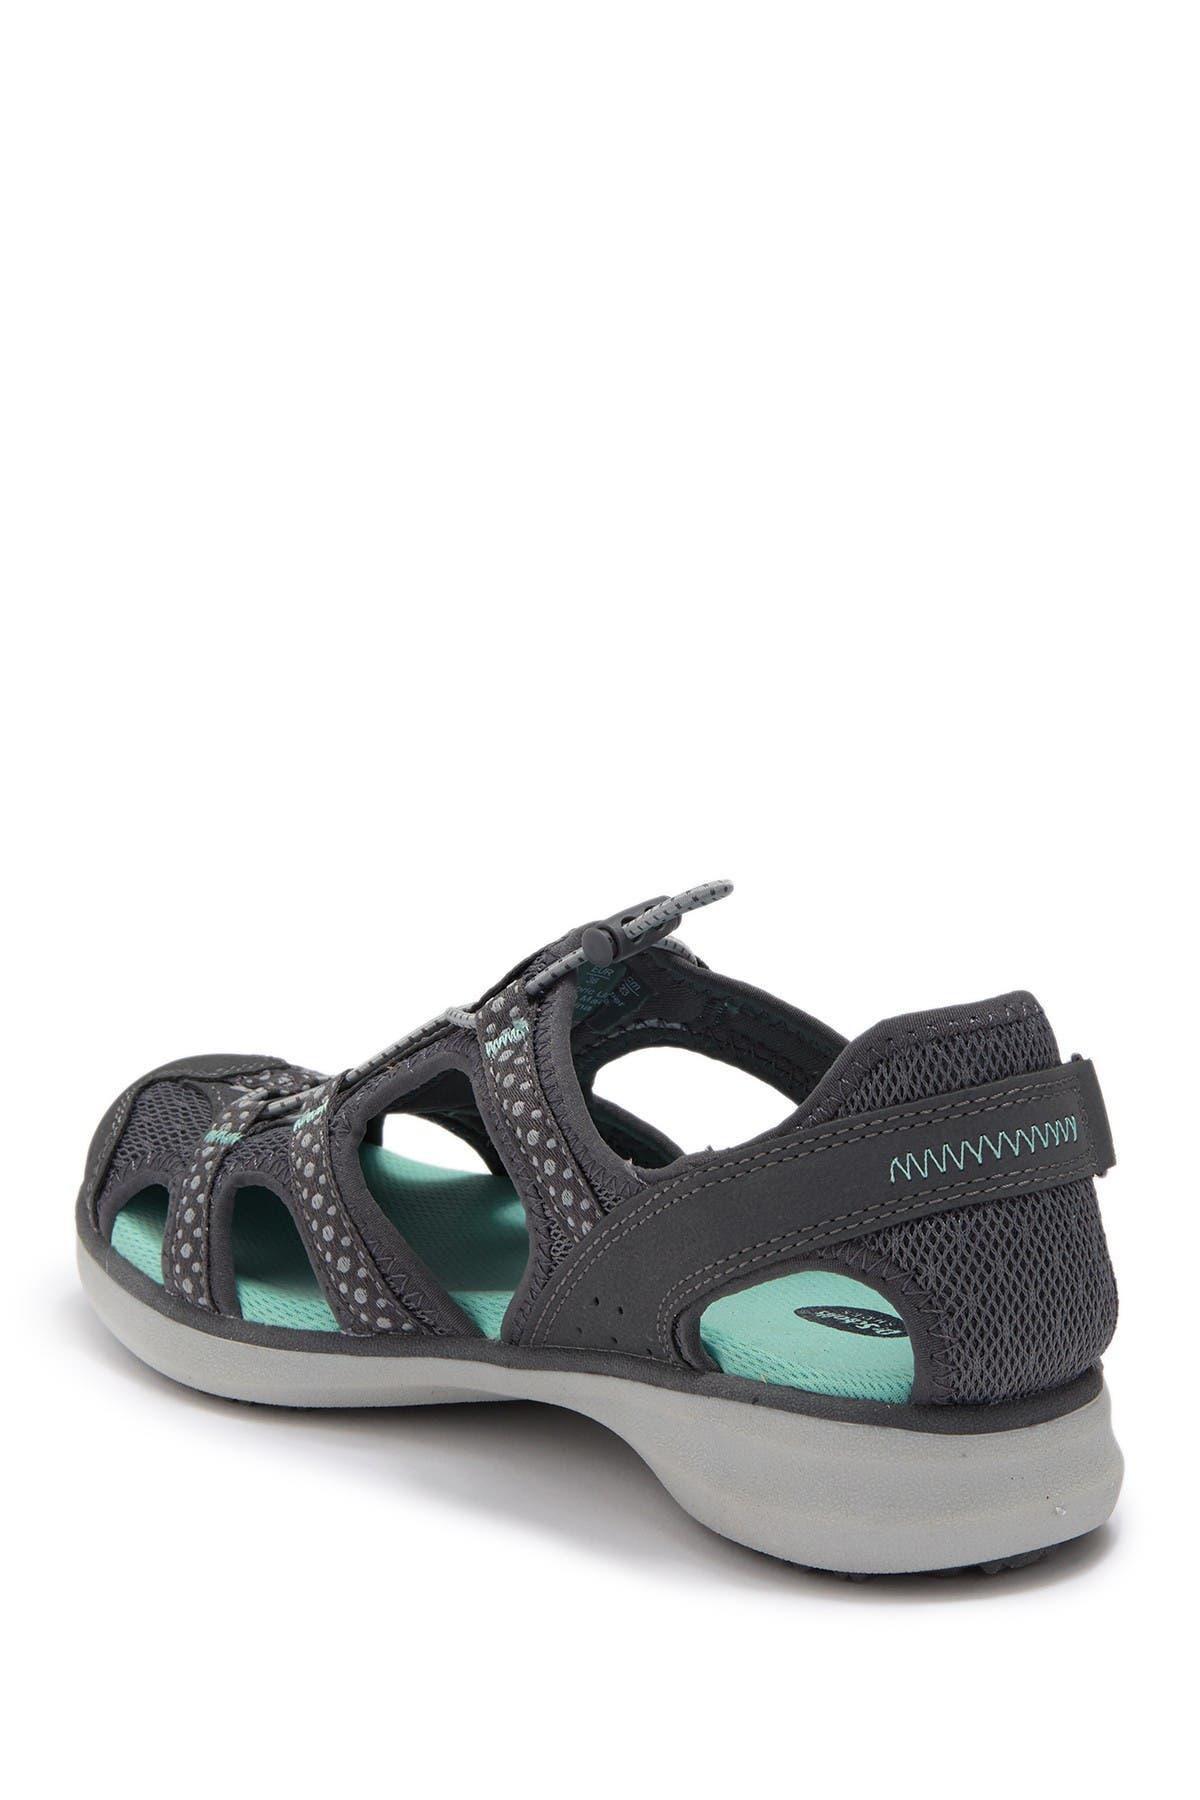 Dr. Scholl's Cancun Slip-on Sport Sandal In Grey